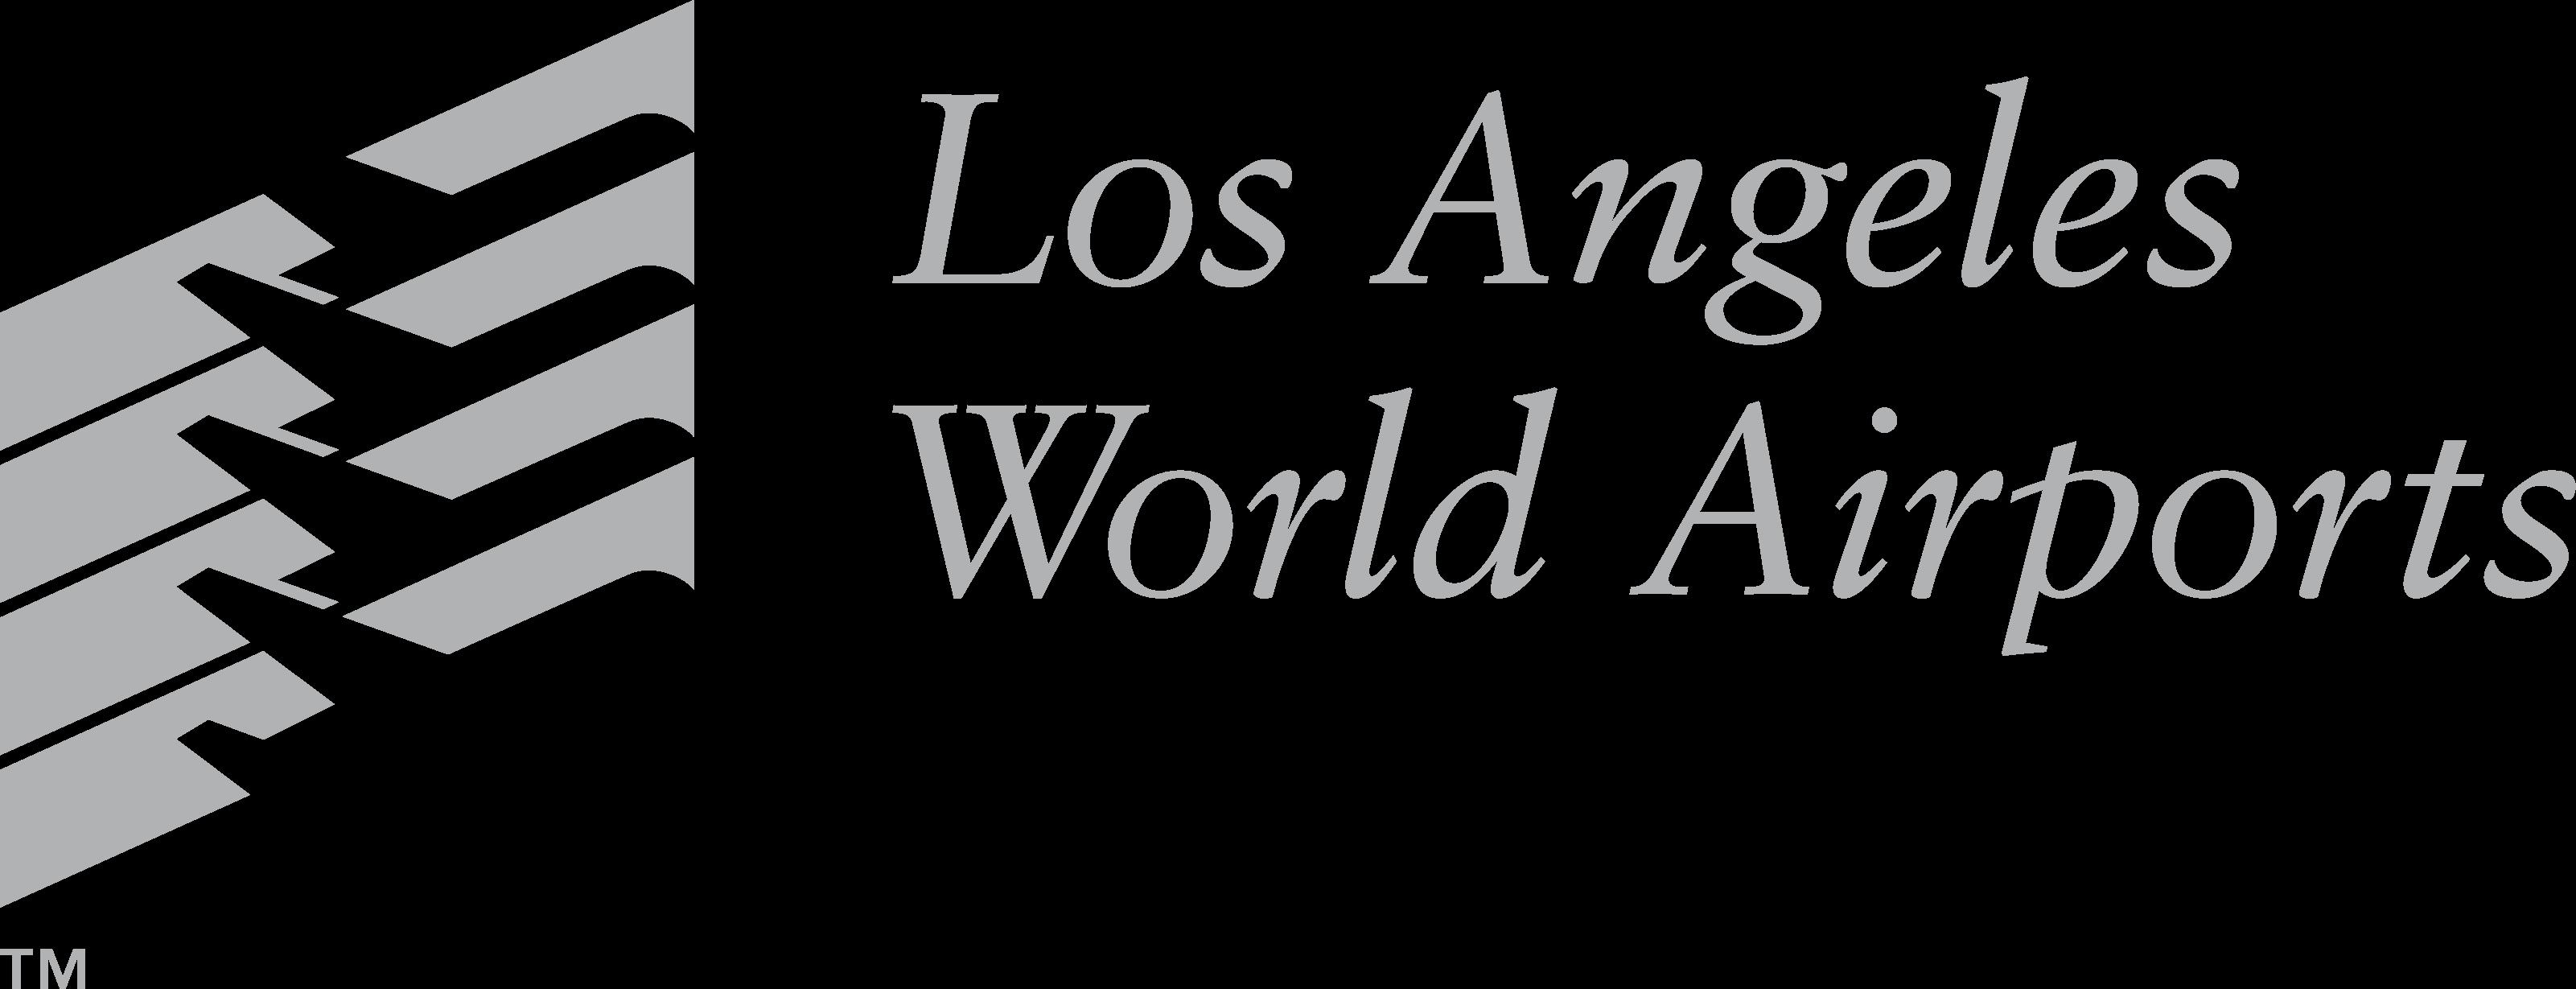 los-angeles-world-airports